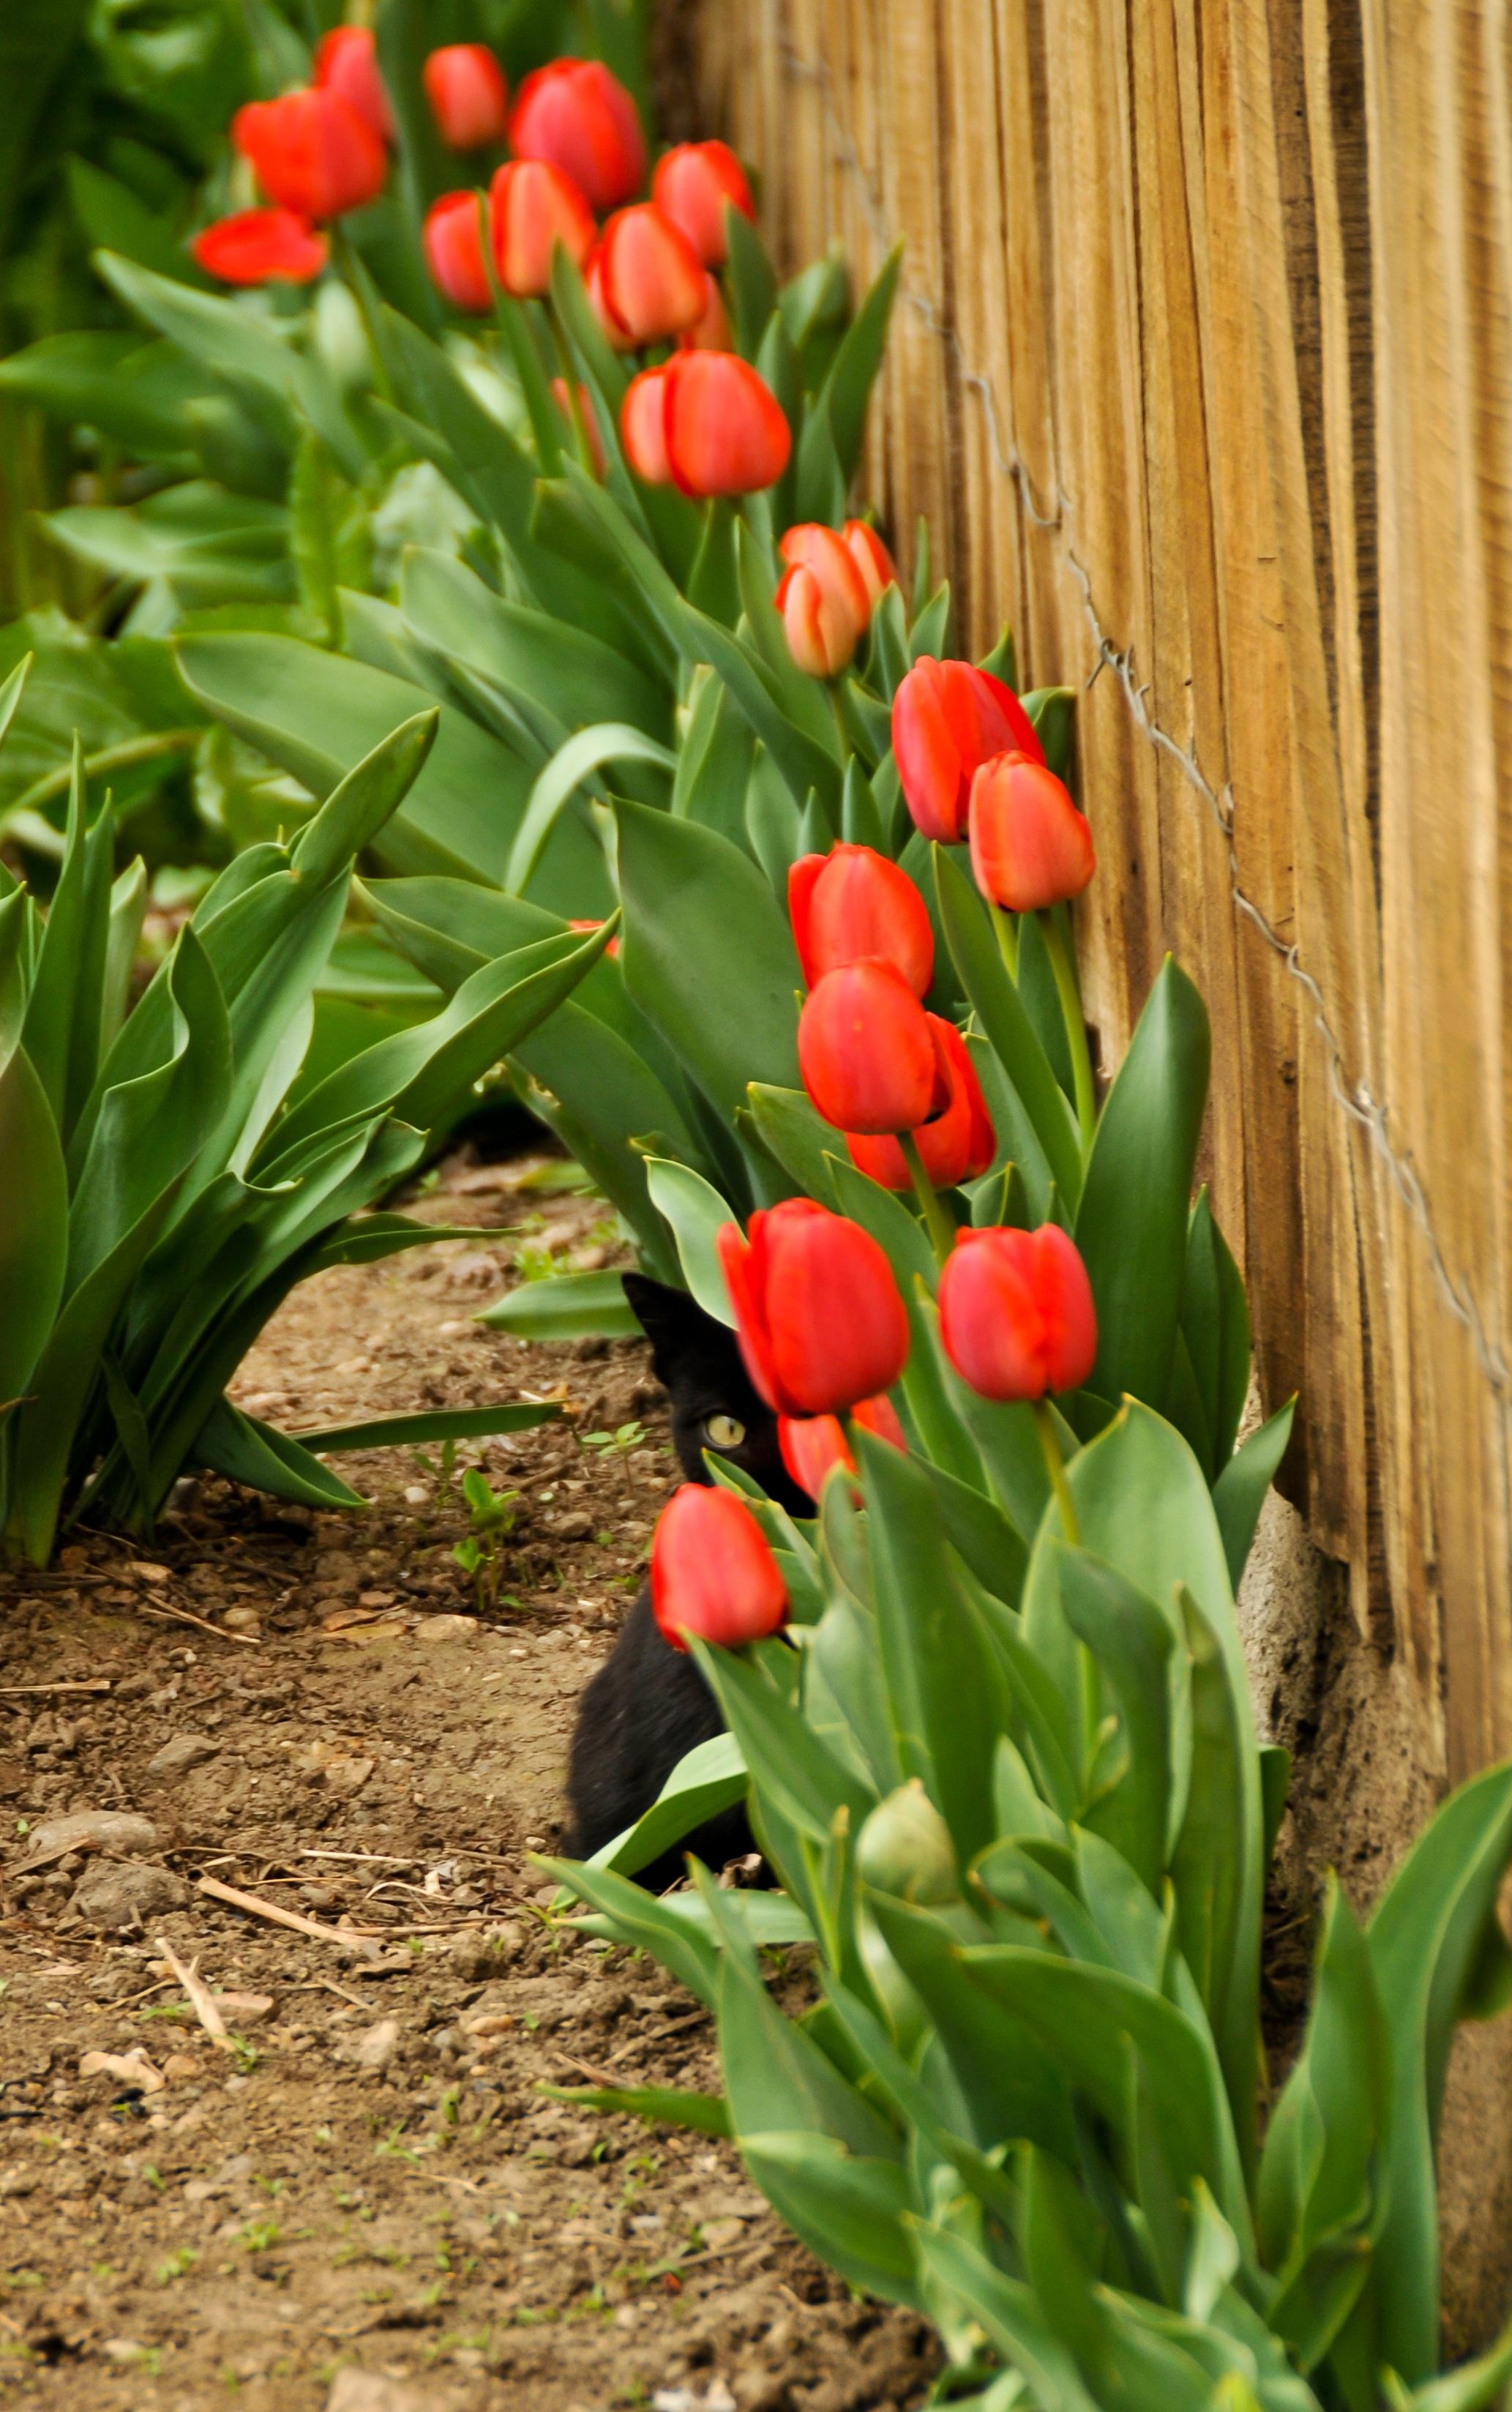 Free Images Flower Animal Tulip Red Cat Botany Black Eye